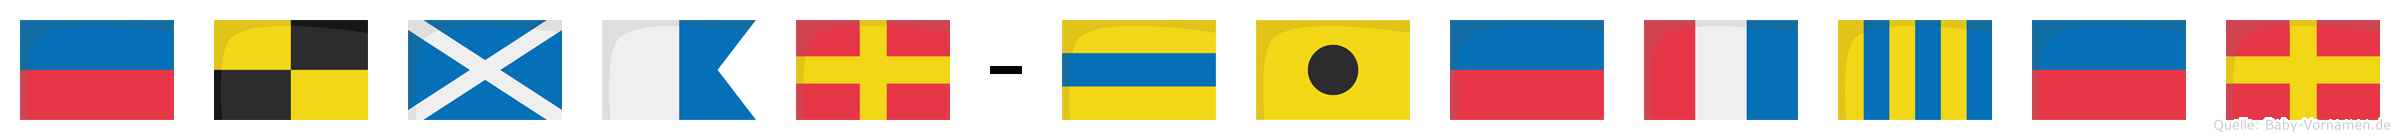 Elmar-Dietger im Flaggenalphabet